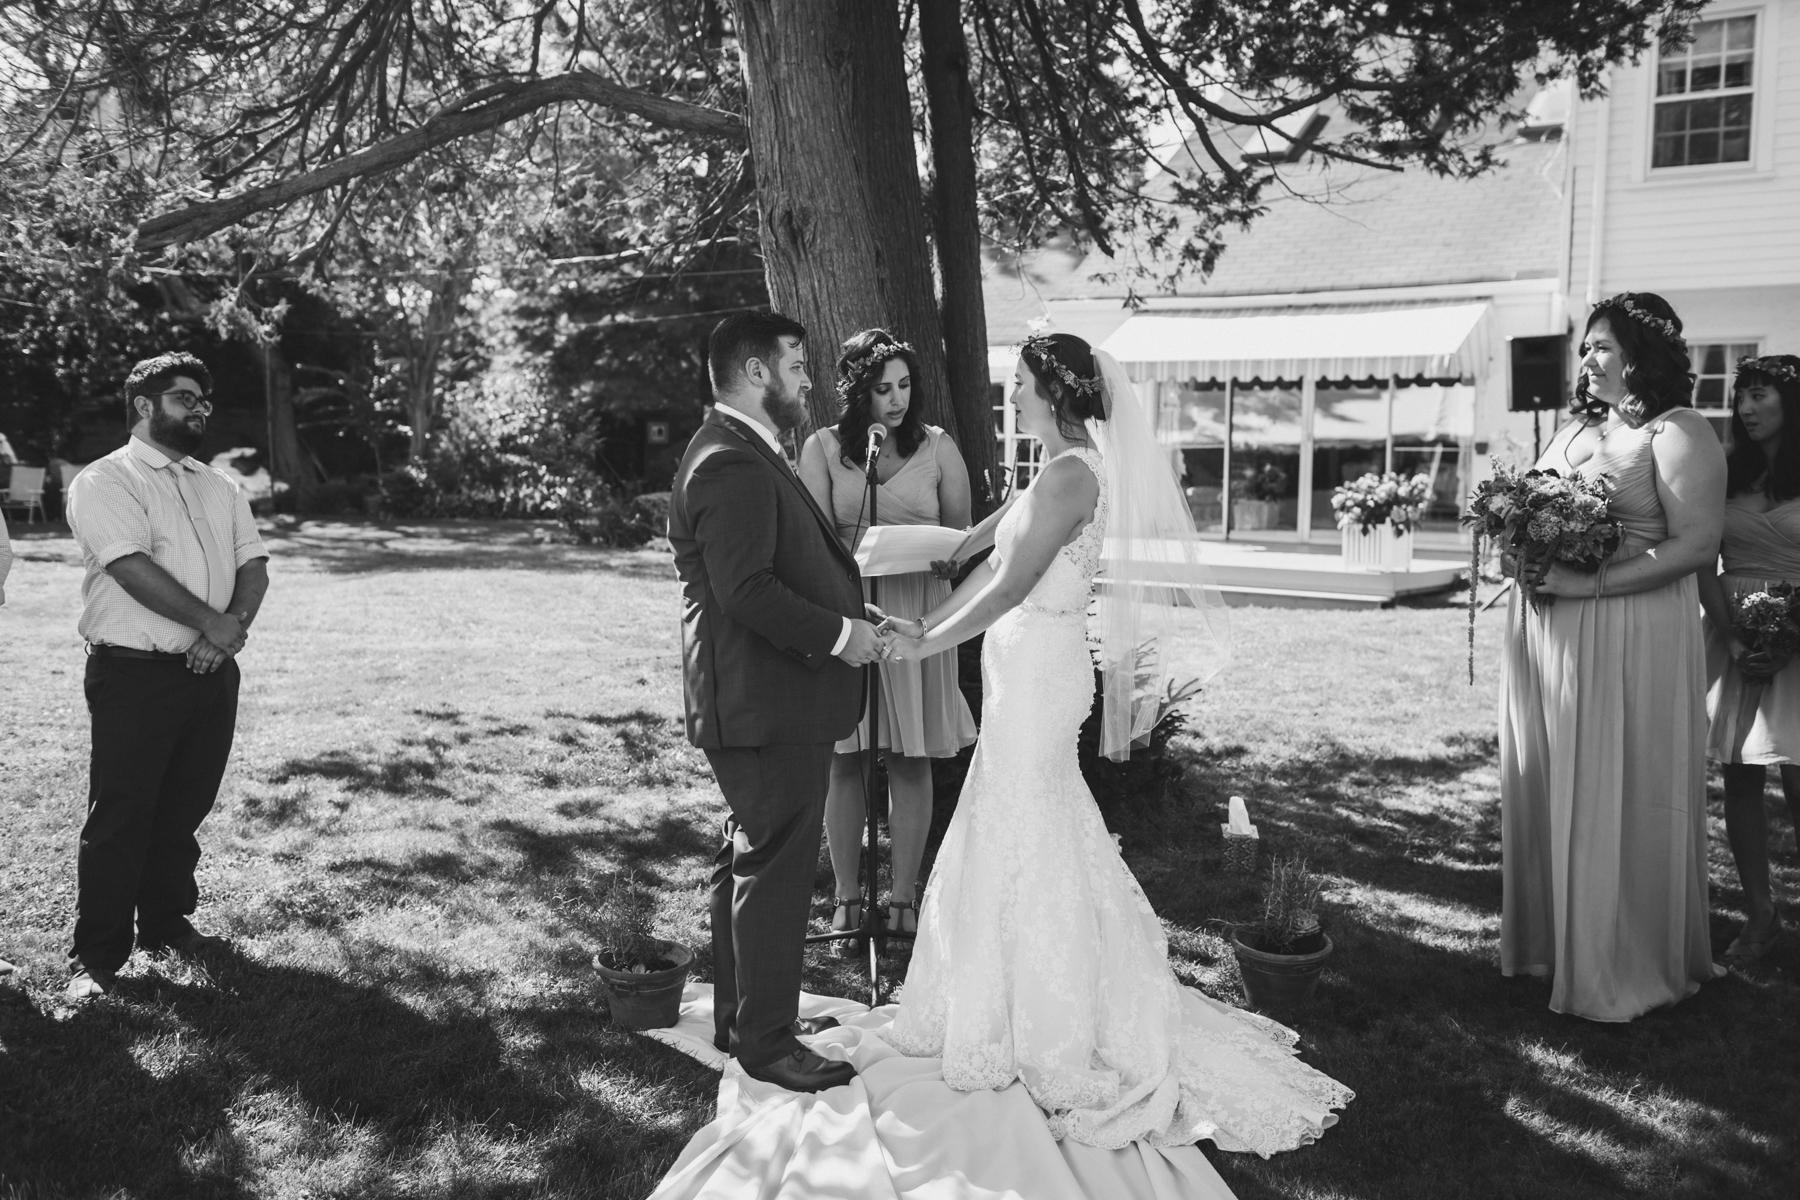 Long-Island-Documentary-Wedding-Photography-Summer-Tent-Wedding-in-New-York-71.jpg